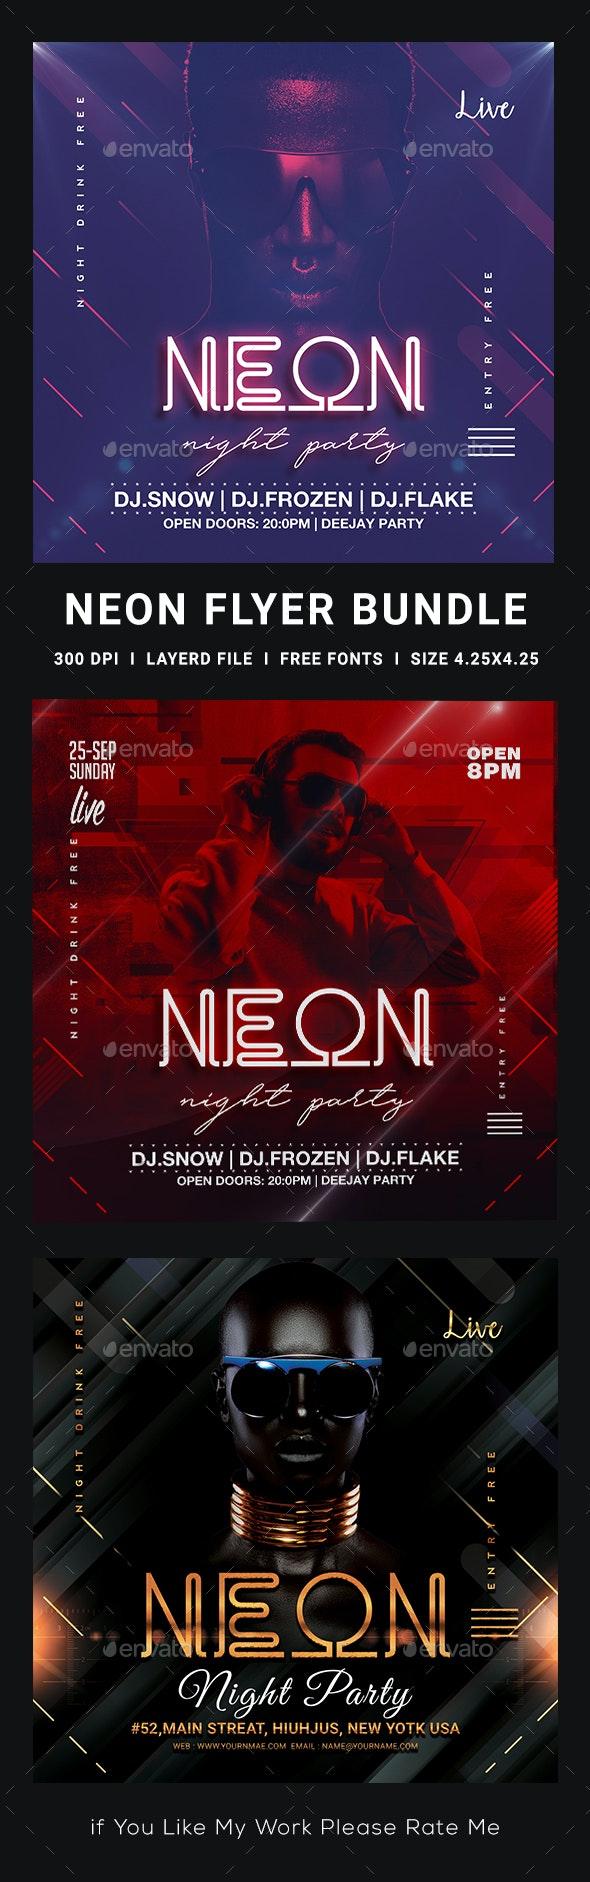 Neon Party Flyer Bundle - Clubs & Parties Events